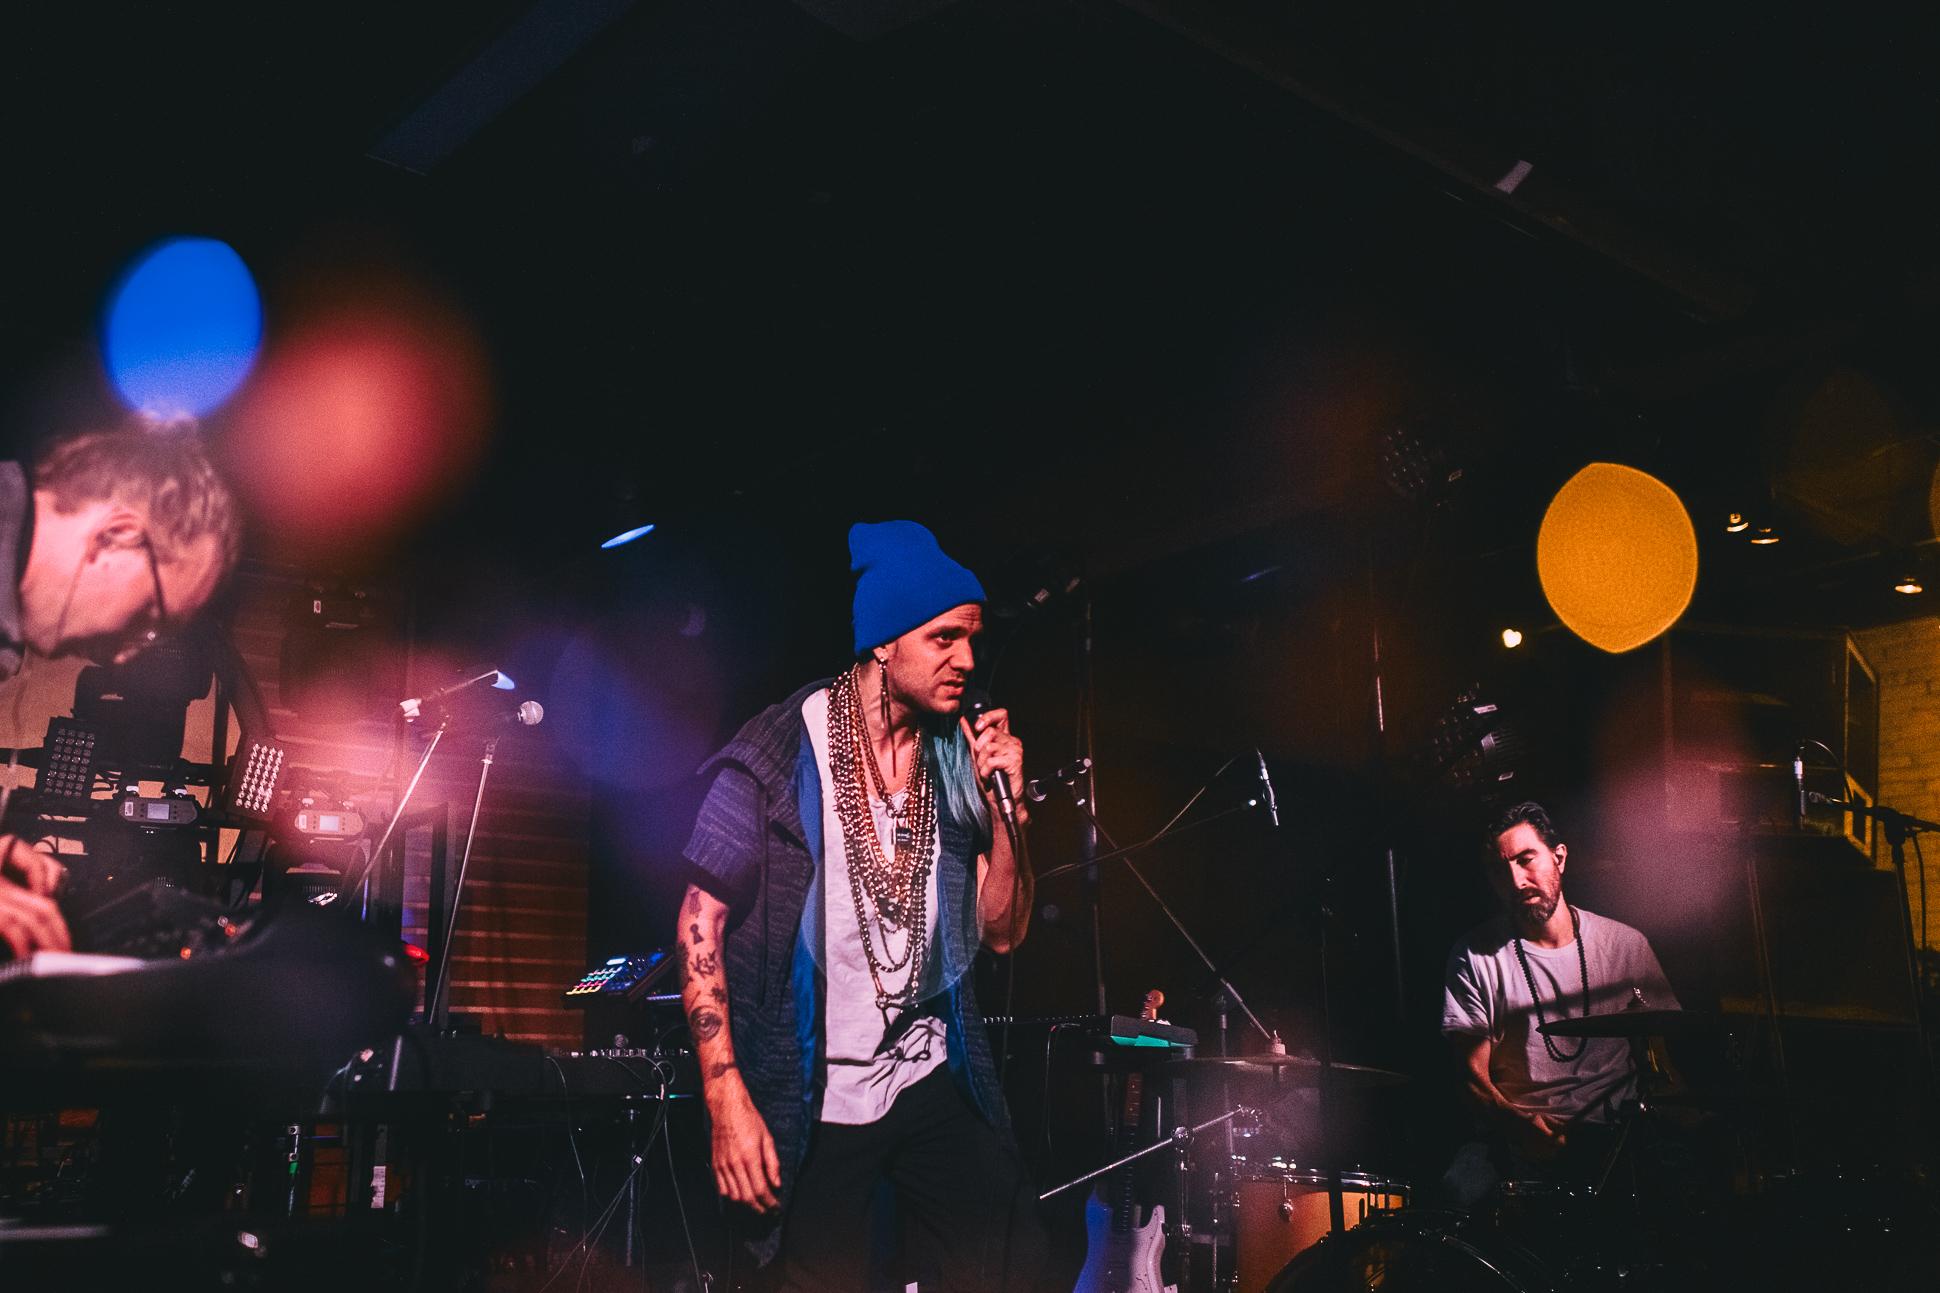 YoungAndSick-FortuneSoundClub-24-01-2019-Vancouver-02.jpg